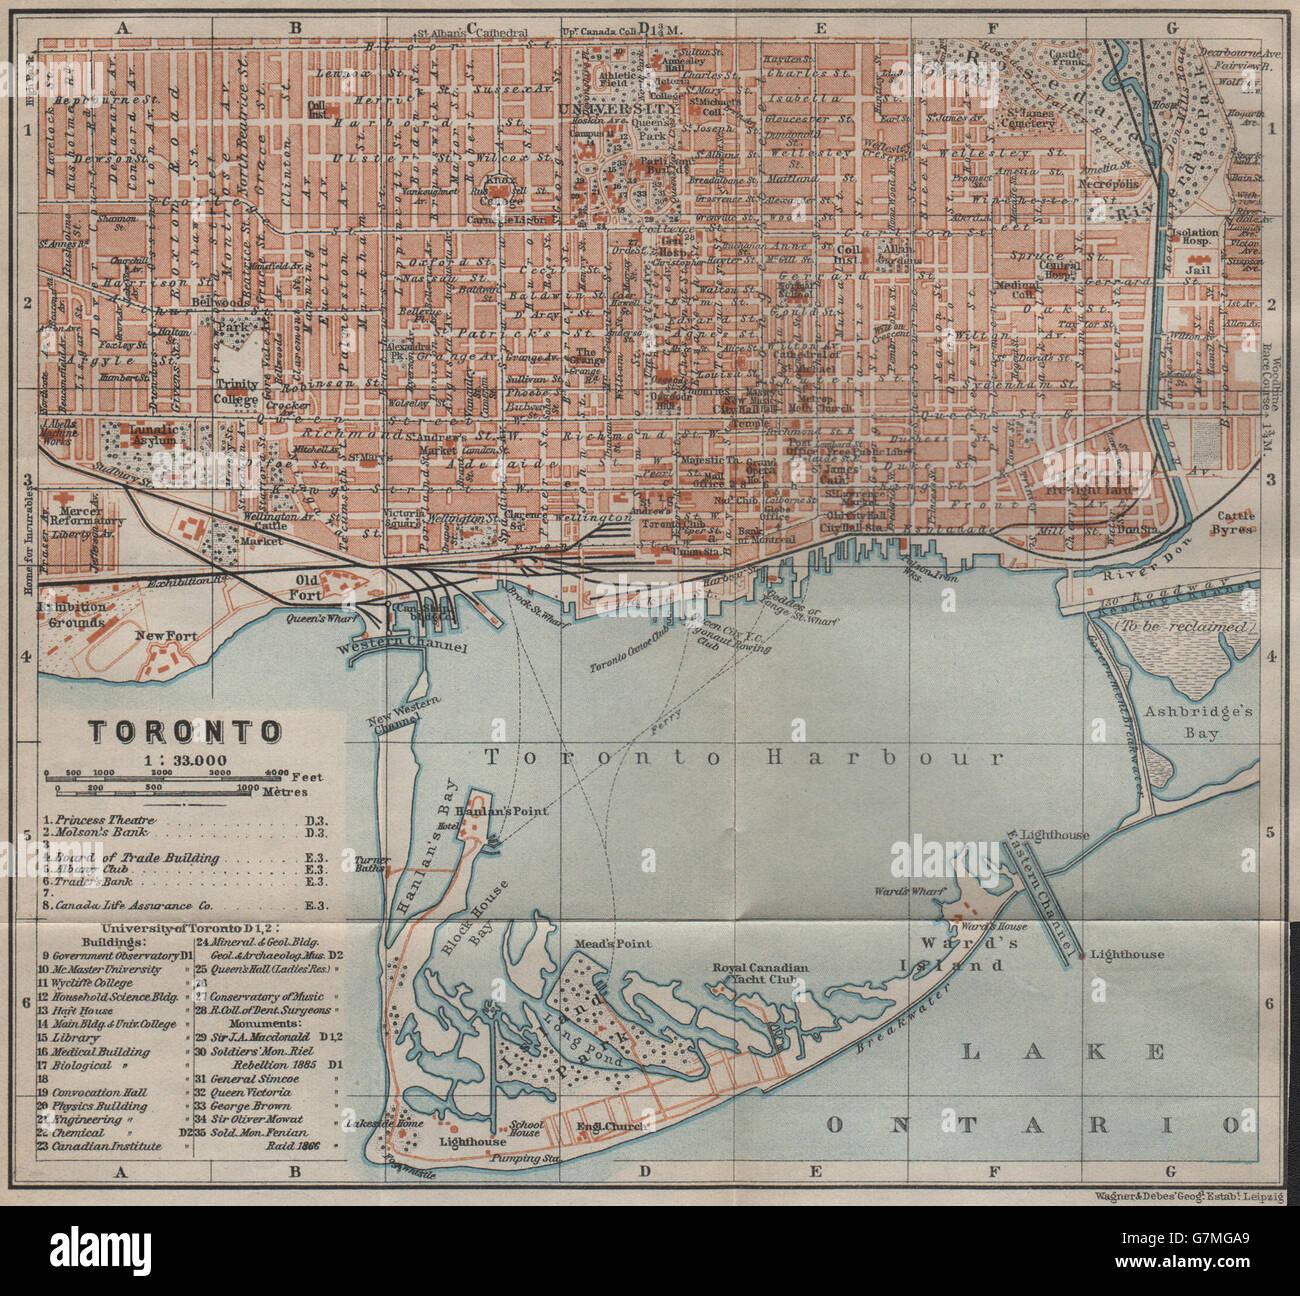 Map Of Canada Toronto Ontario.Toronto Town City Plan Ontario Canada Baedeker 1922 Vintage Map